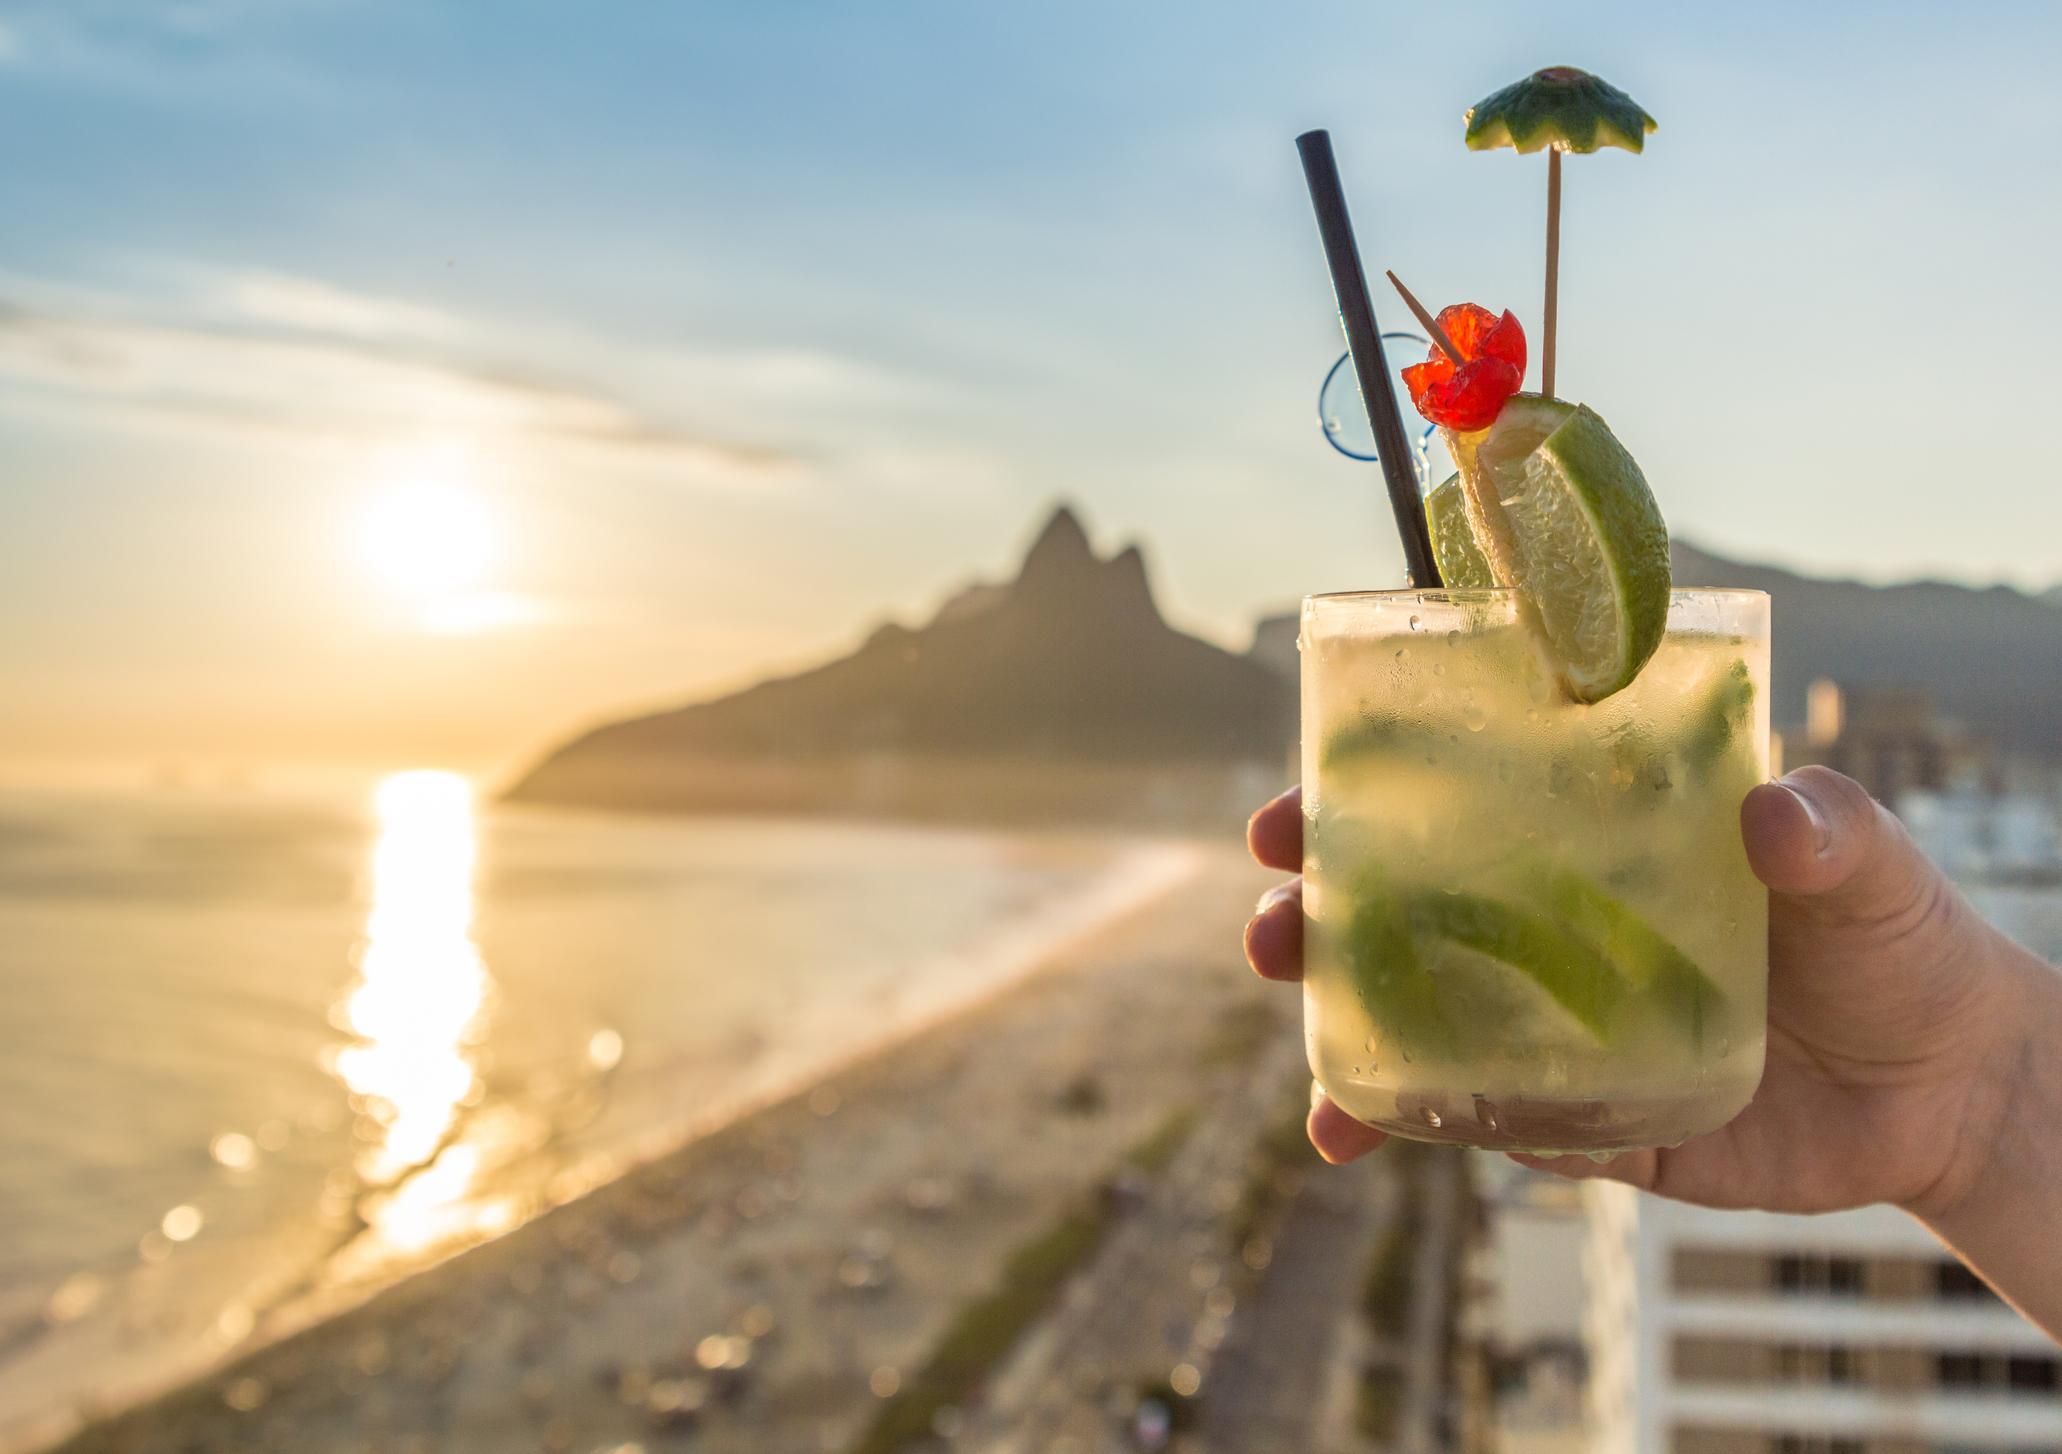 Nothing beats a cold Cocktail on a hot summer's day. Taken on Ipanema Beach, Rio de Janeiro, Brazil